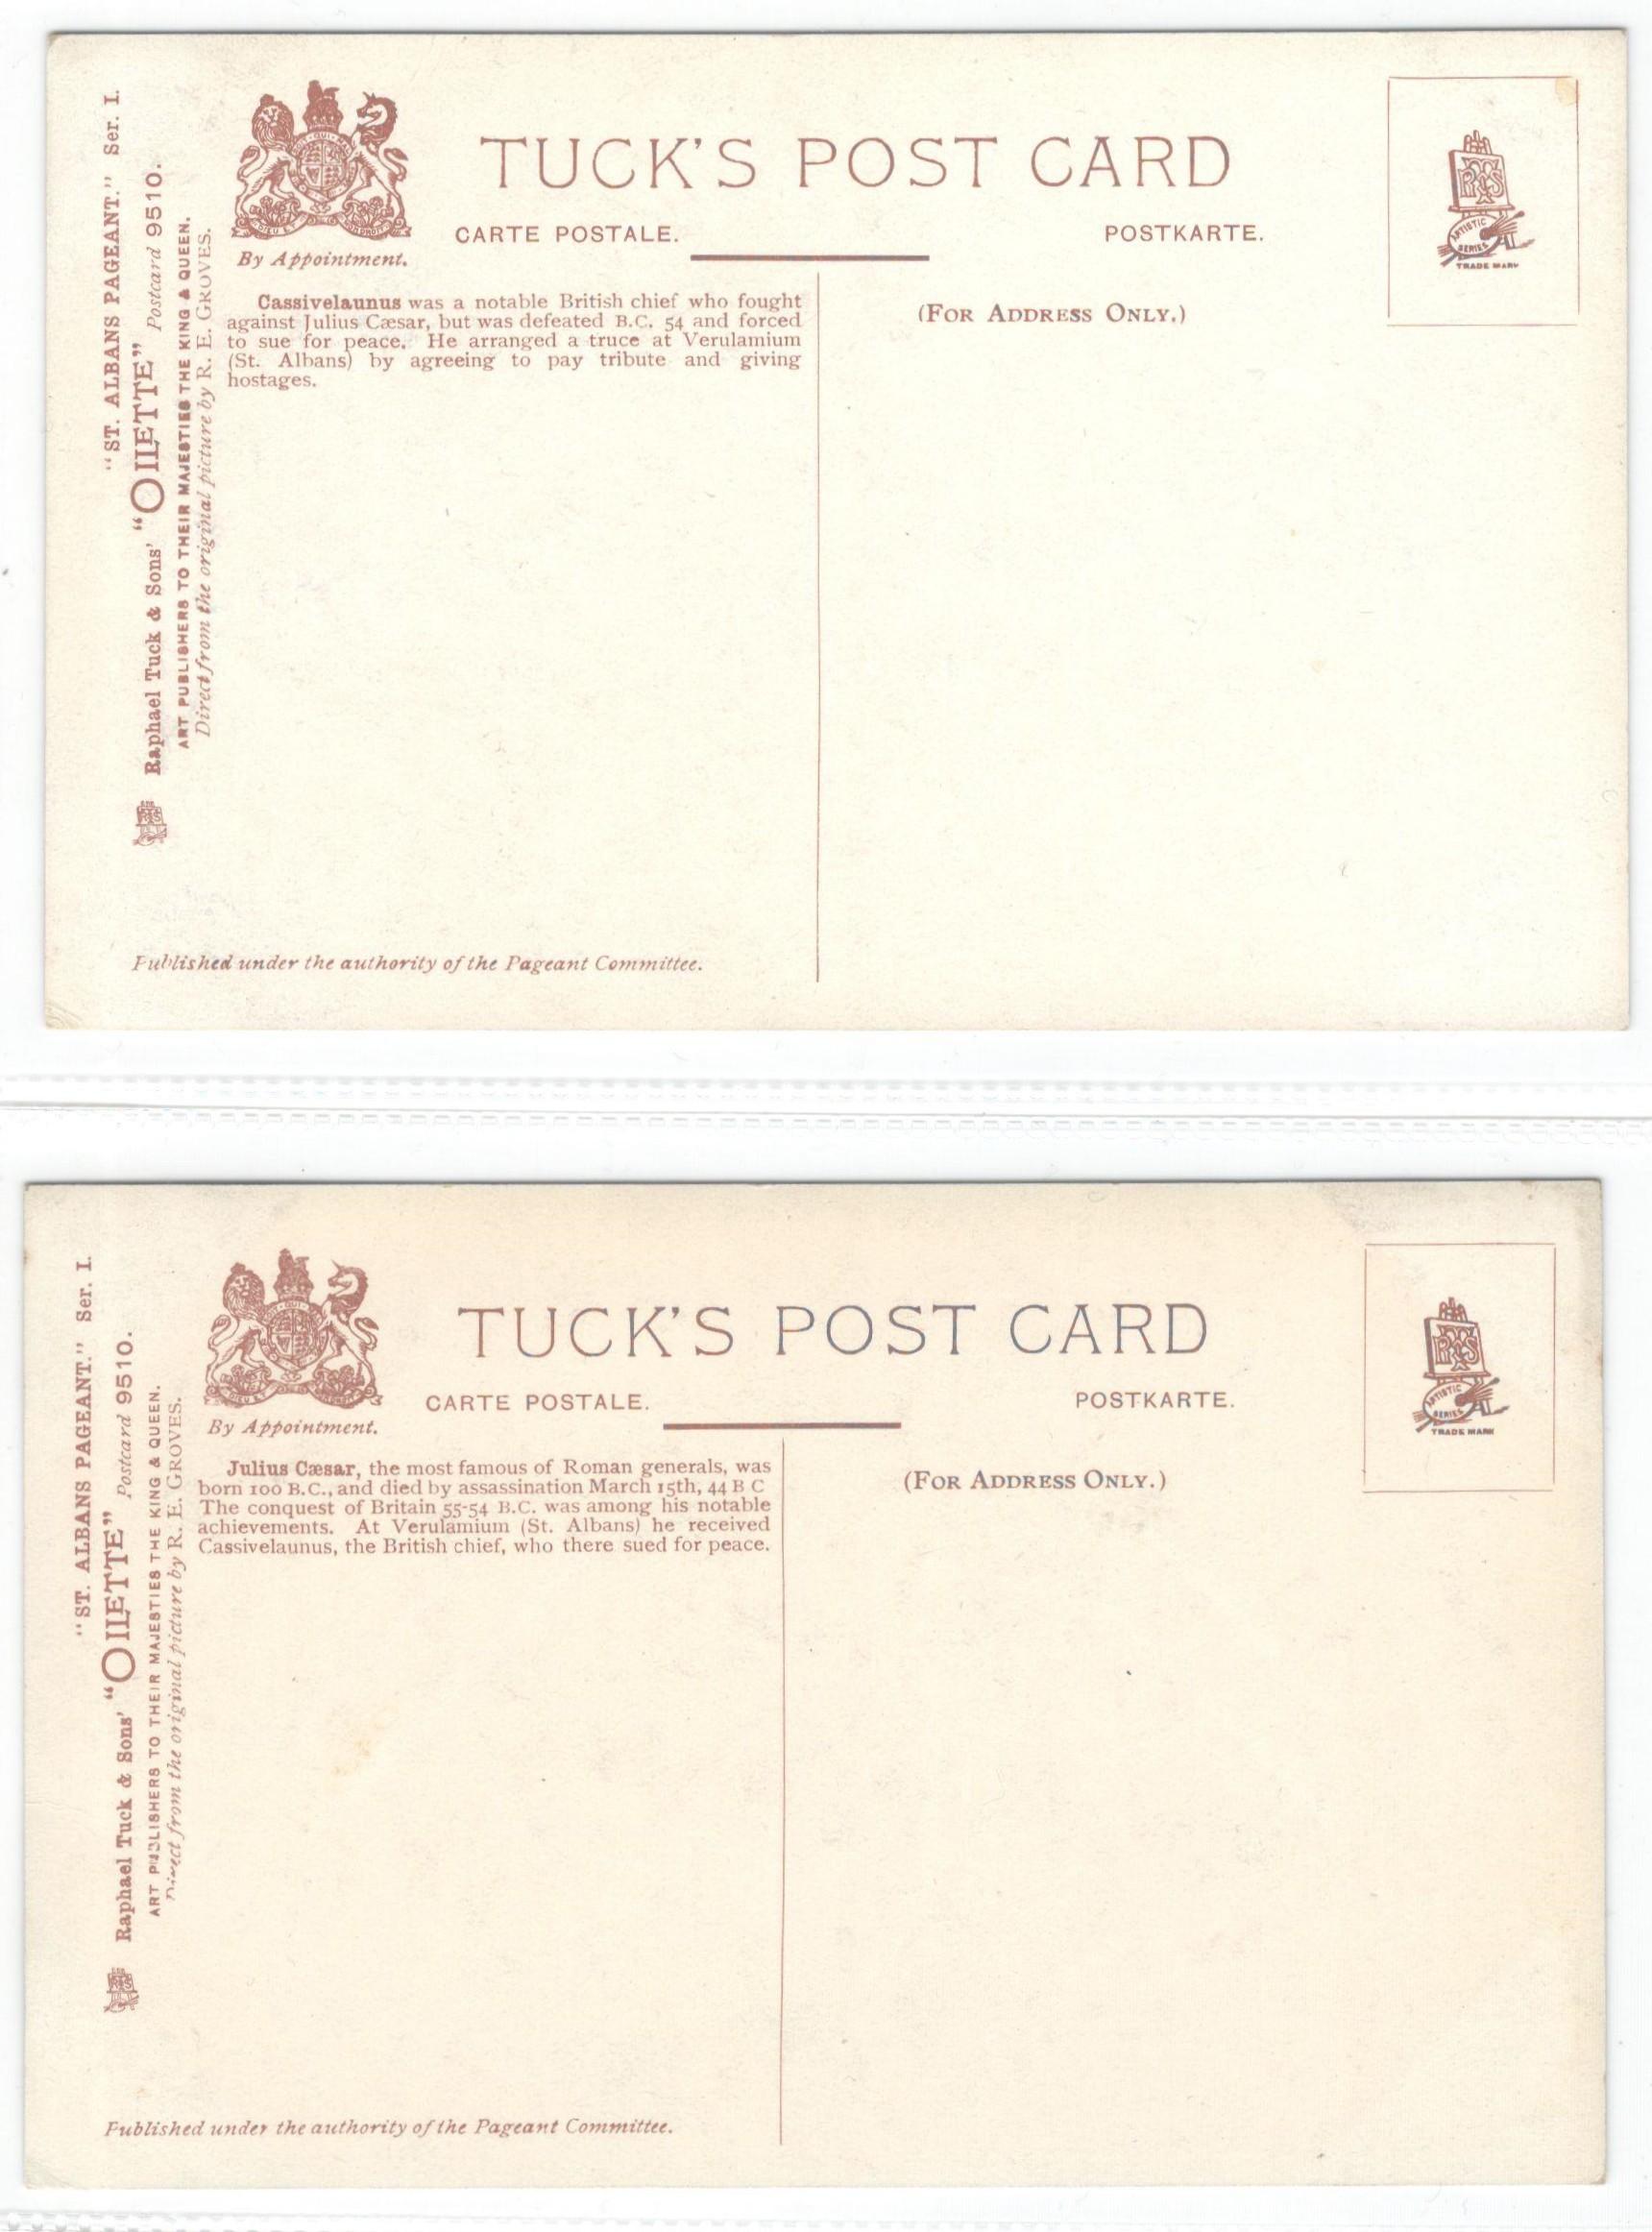 ST ALBANS PAGEANTS SERIES I, II & III - SIX RAPHAEL TUCK POSTCARDS - Image 2 of 6